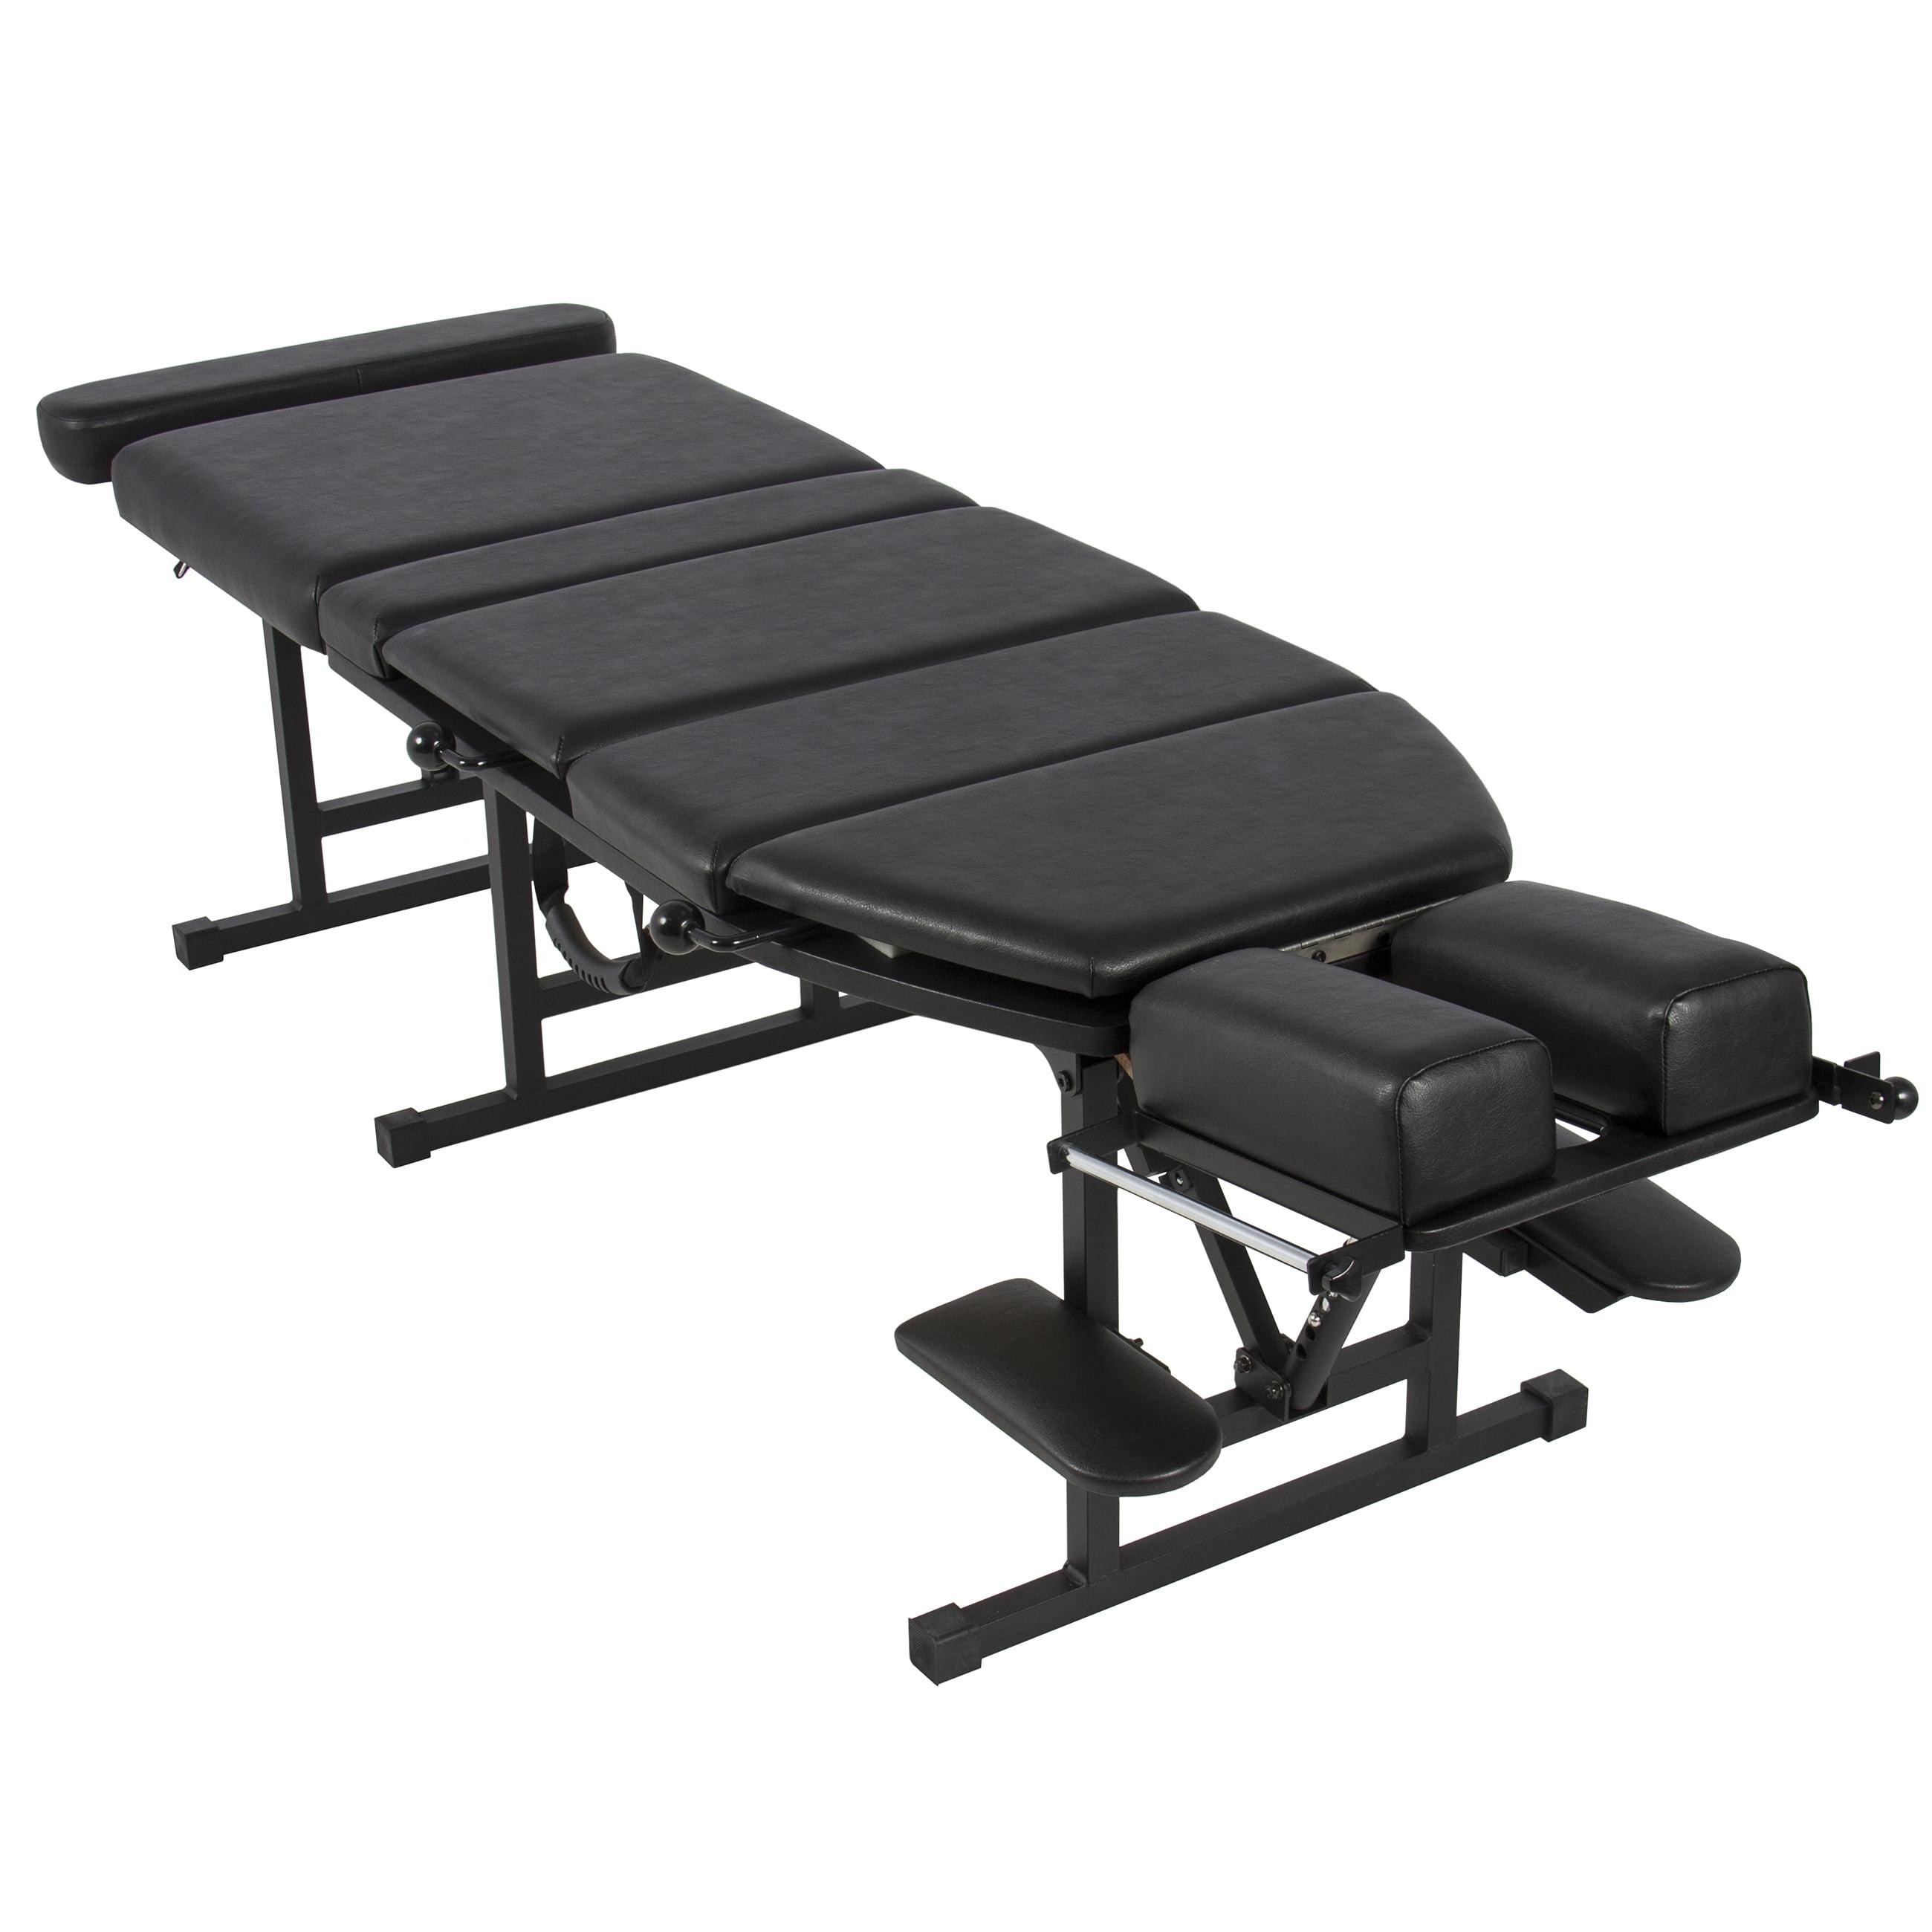 Portable Folding Chiropractic Table Folding Chiro Drop Ta...